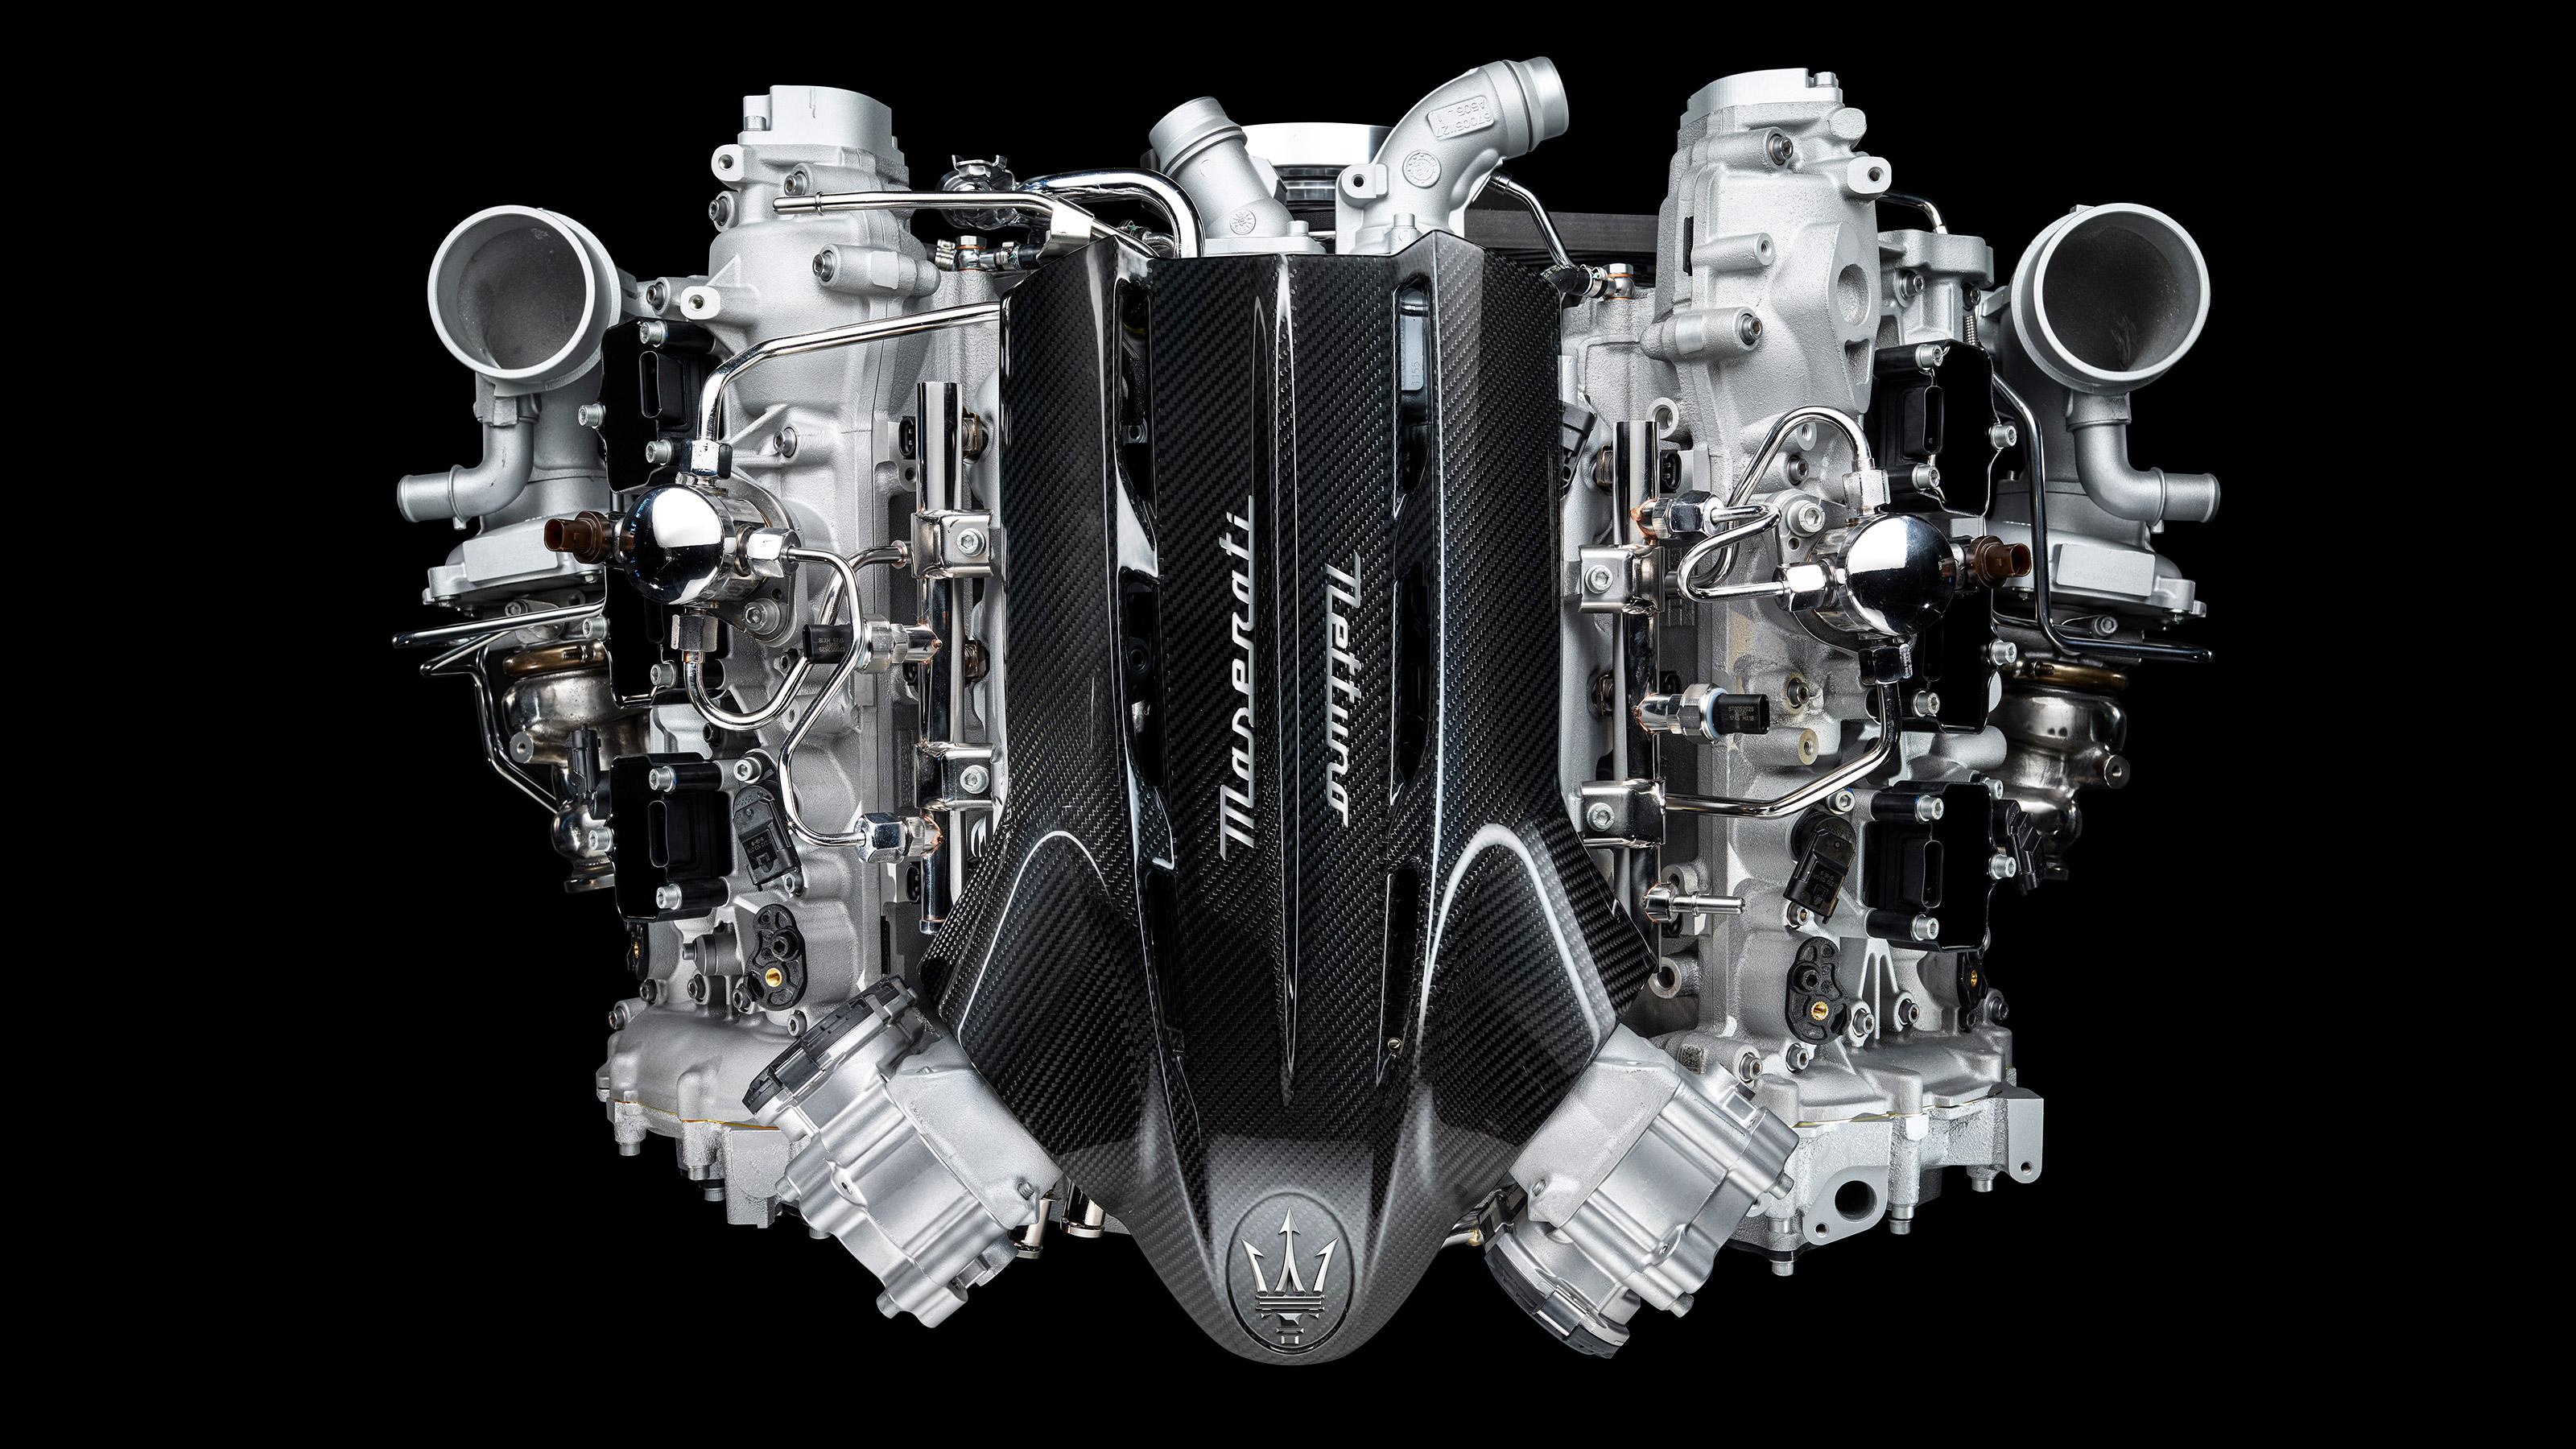 2020 Maserati MC20 to receive 613bhp twin-turbo V6